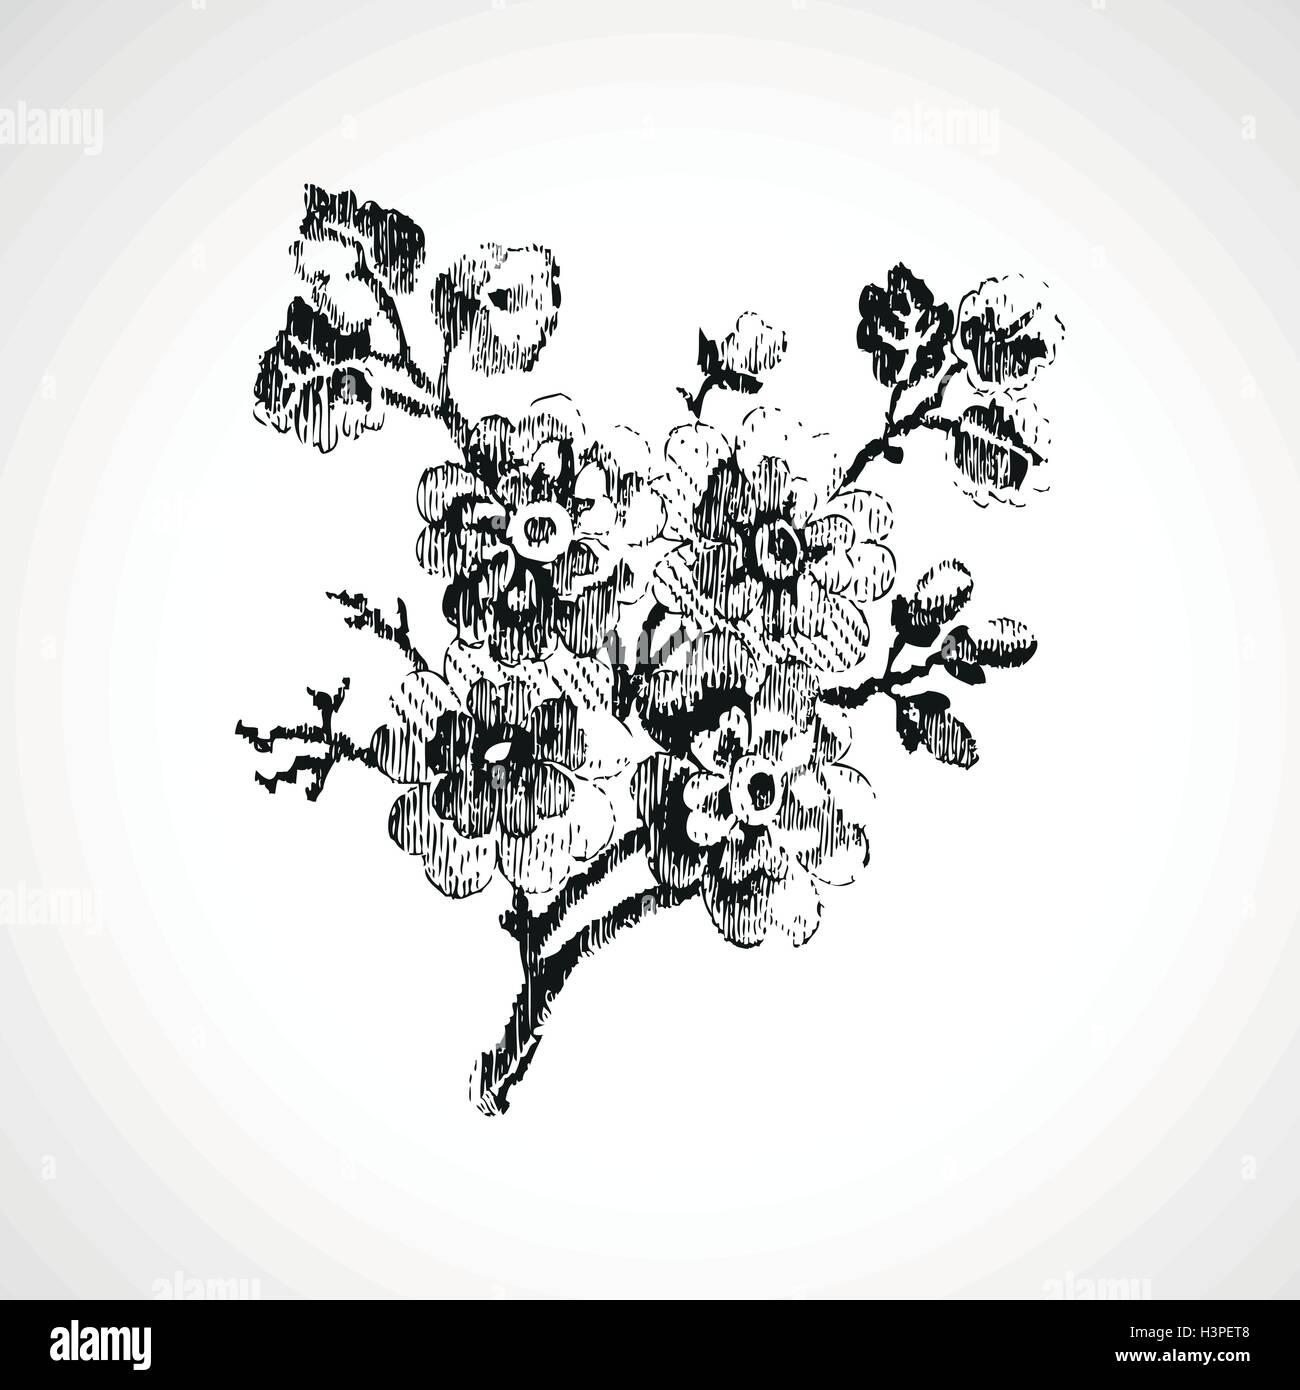 Ramita Dibujados A Mano Con Flores Vintage Antecedentes Aislados